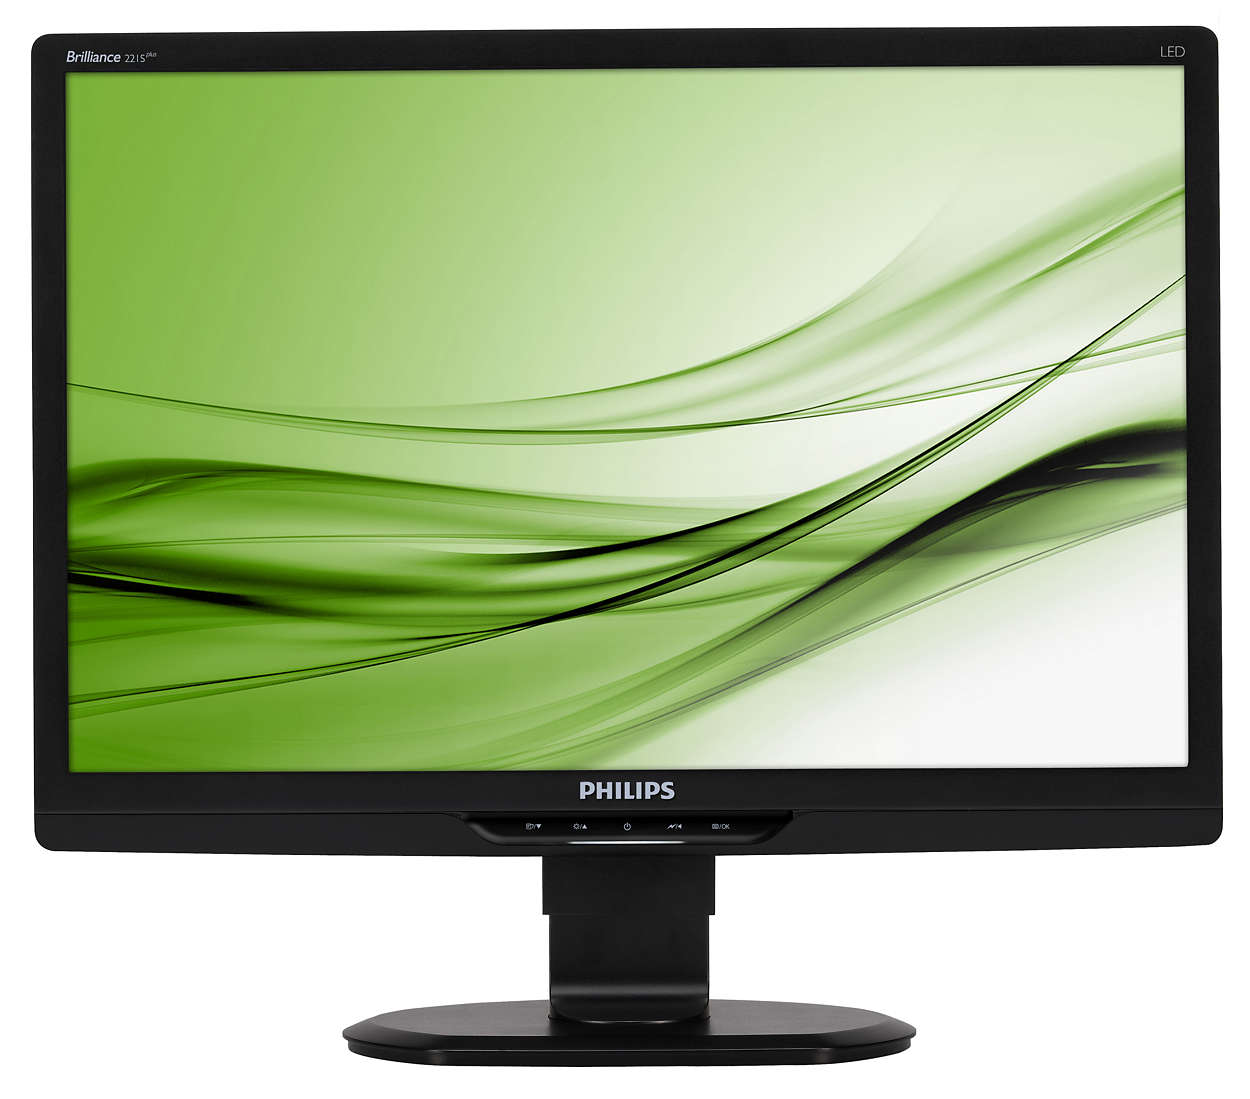 Productiviteitsverhogende ergonomische LED-monitor